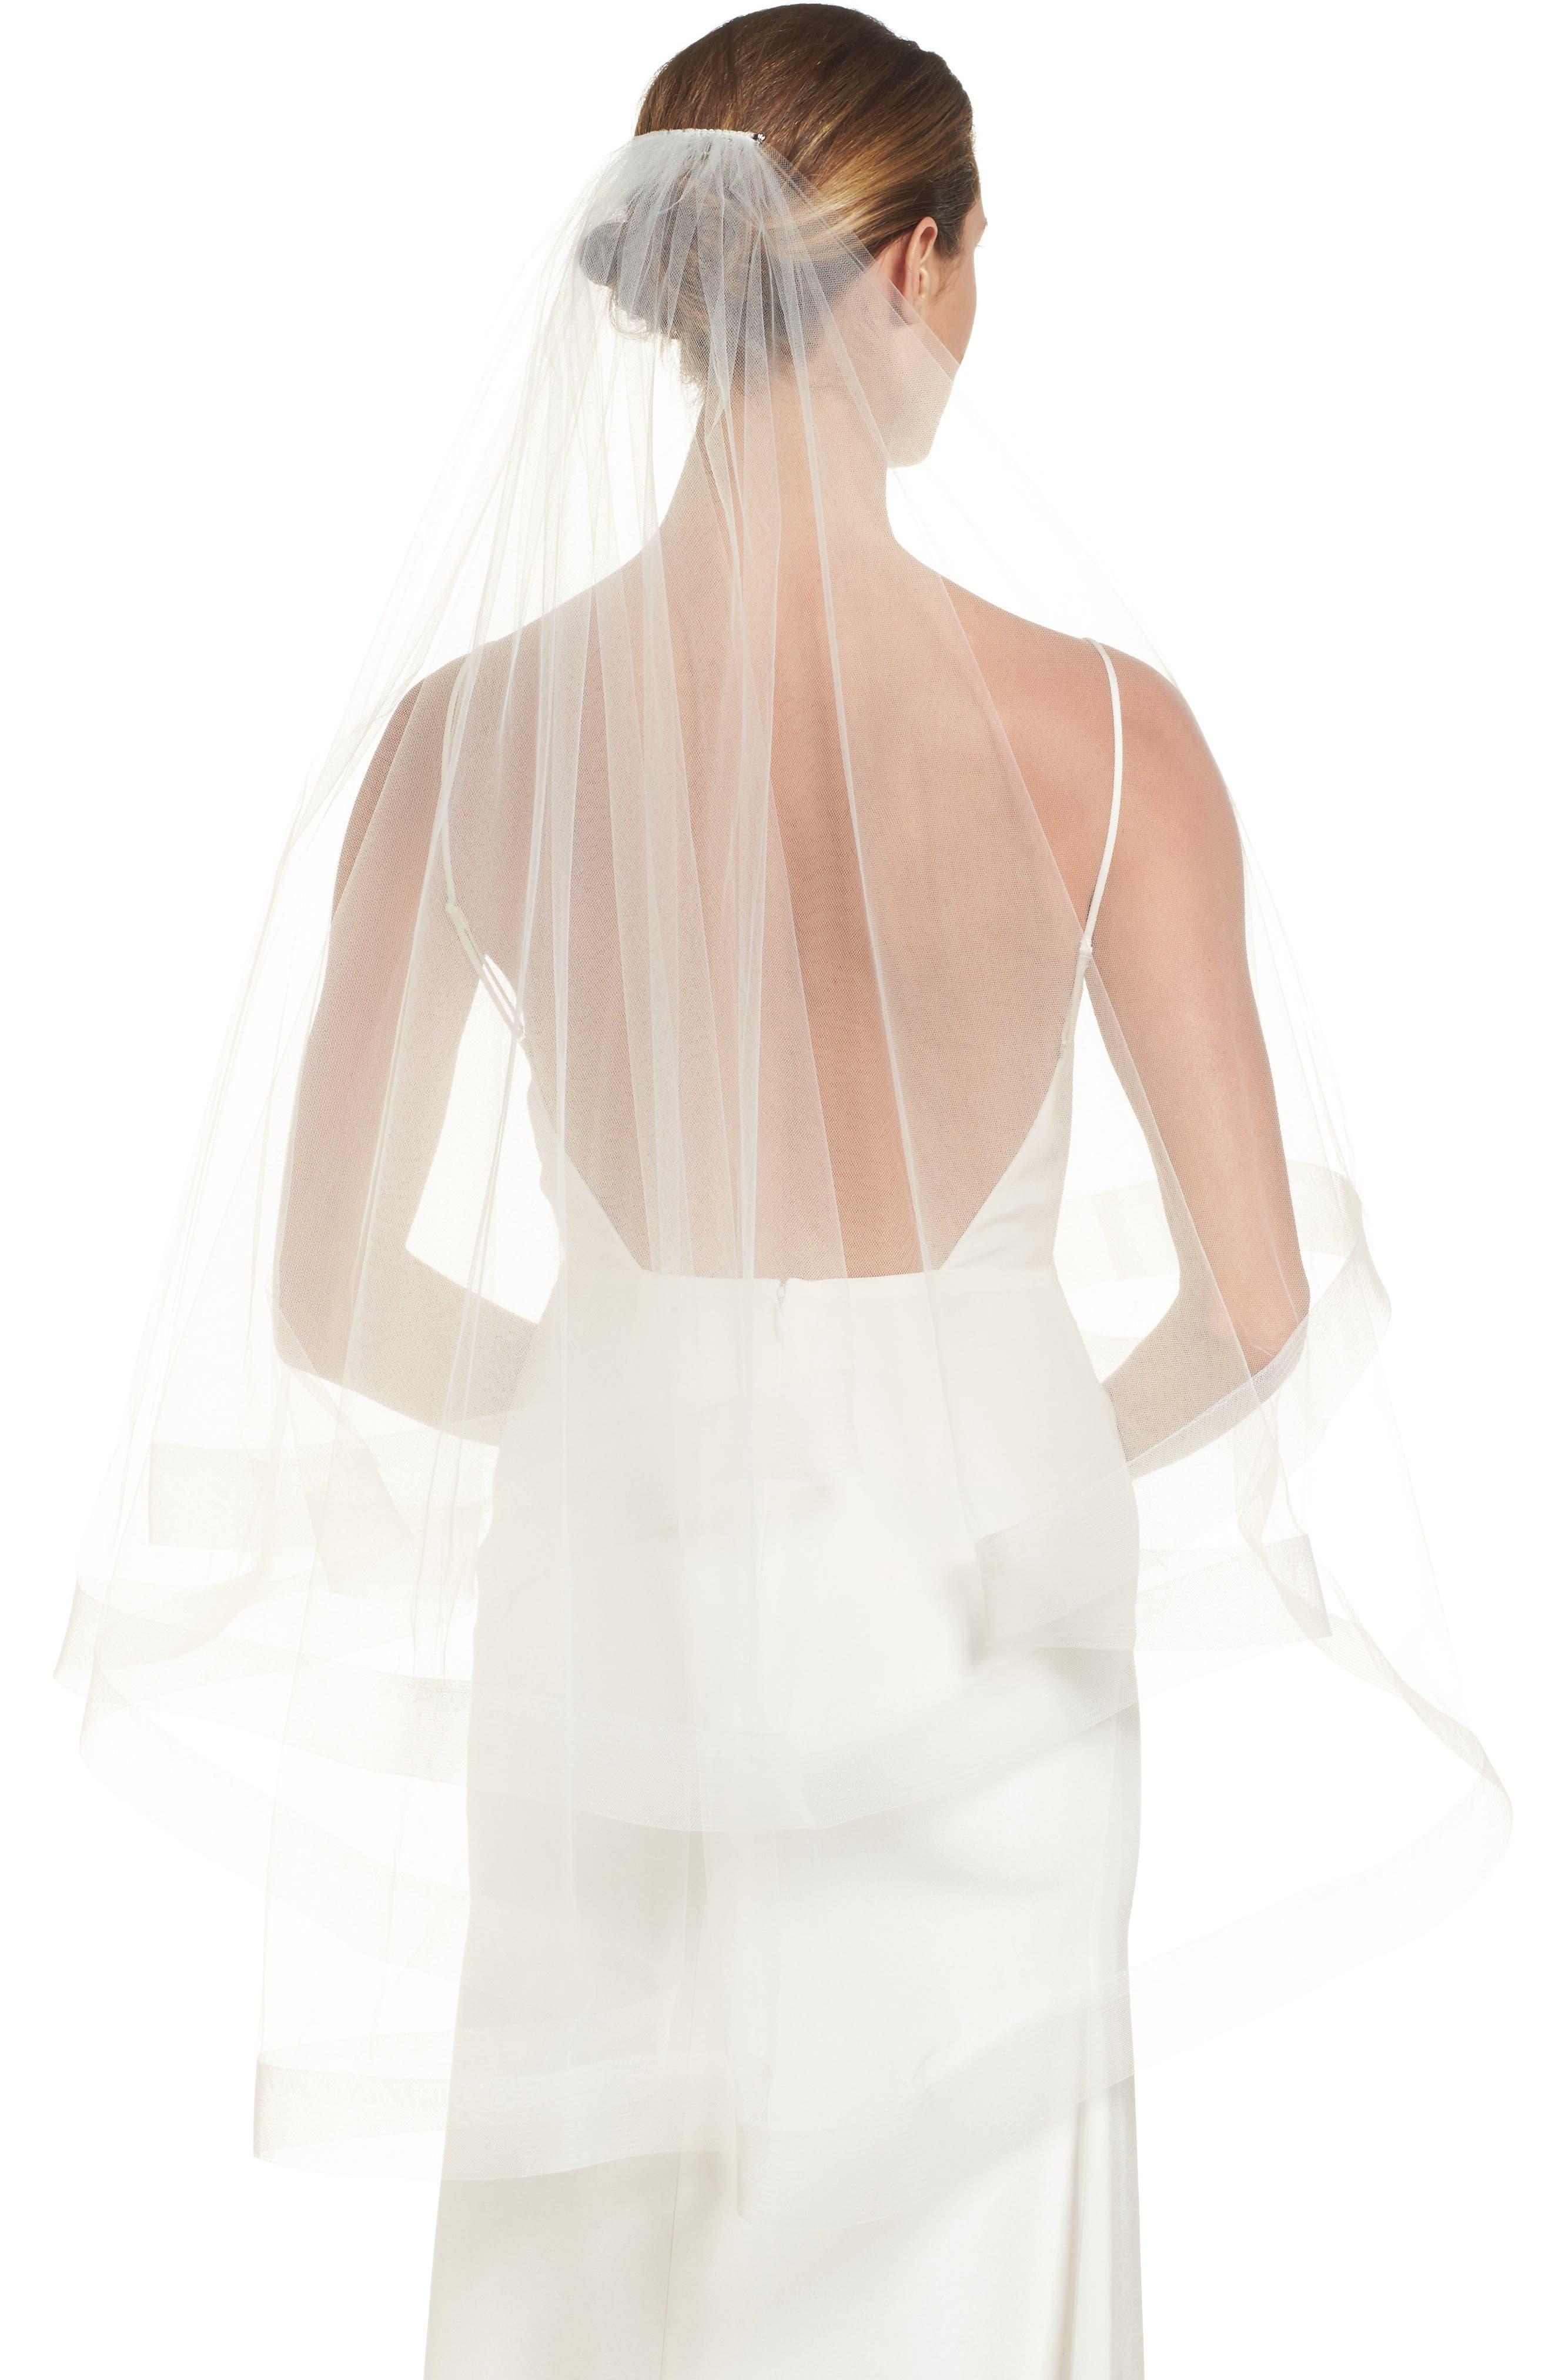 VEIL TRENDS Dickinson Bridal Veil